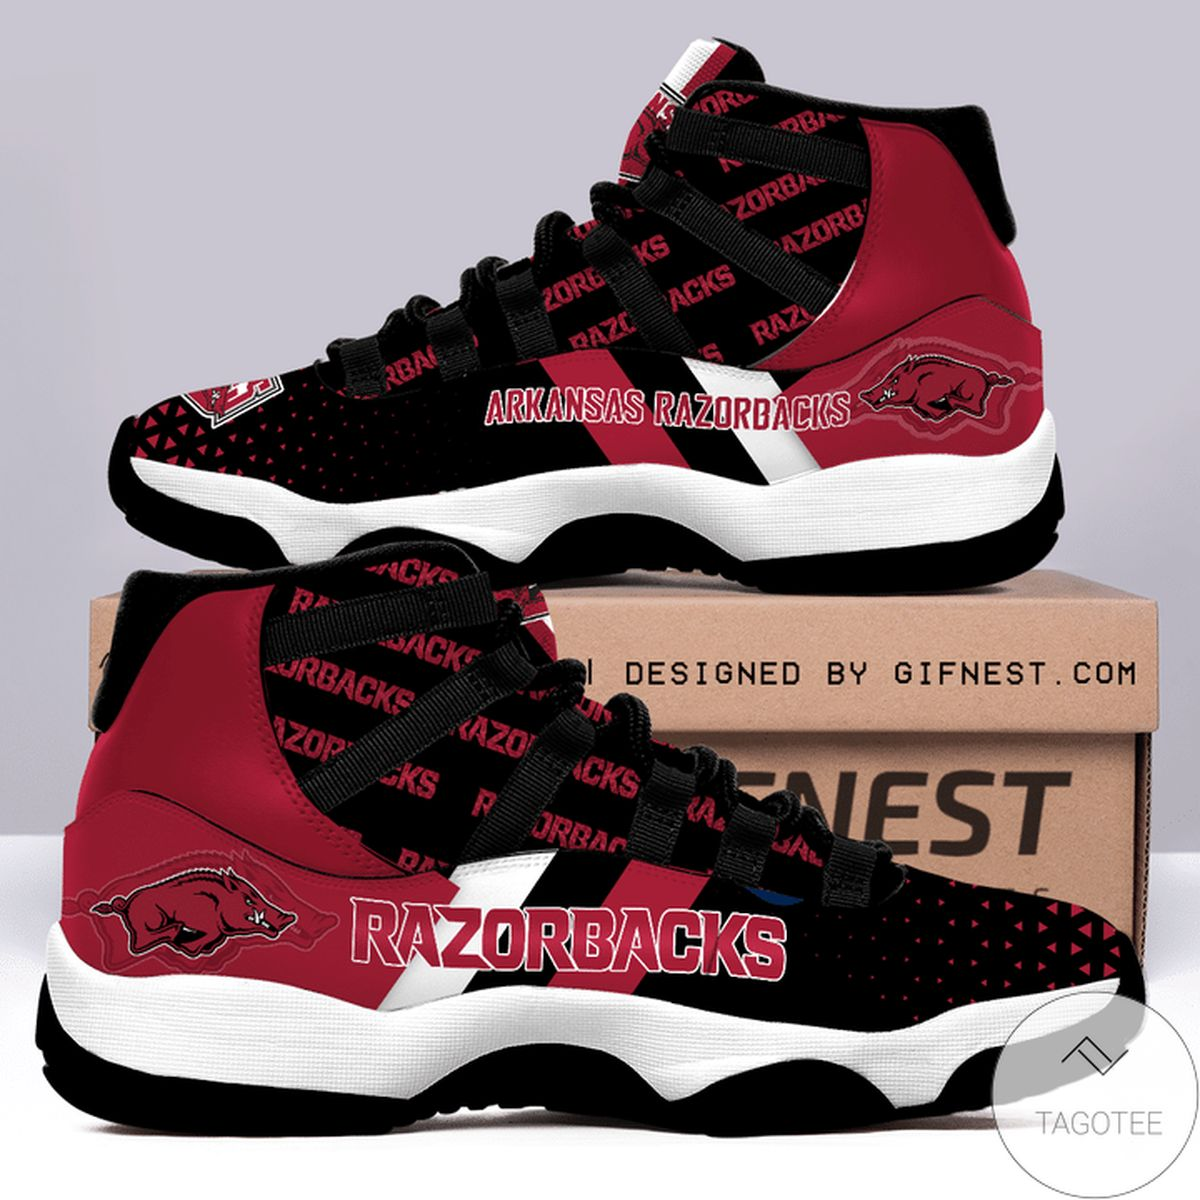 Arkansas Razorbacks Air Jordan 11 Shoes